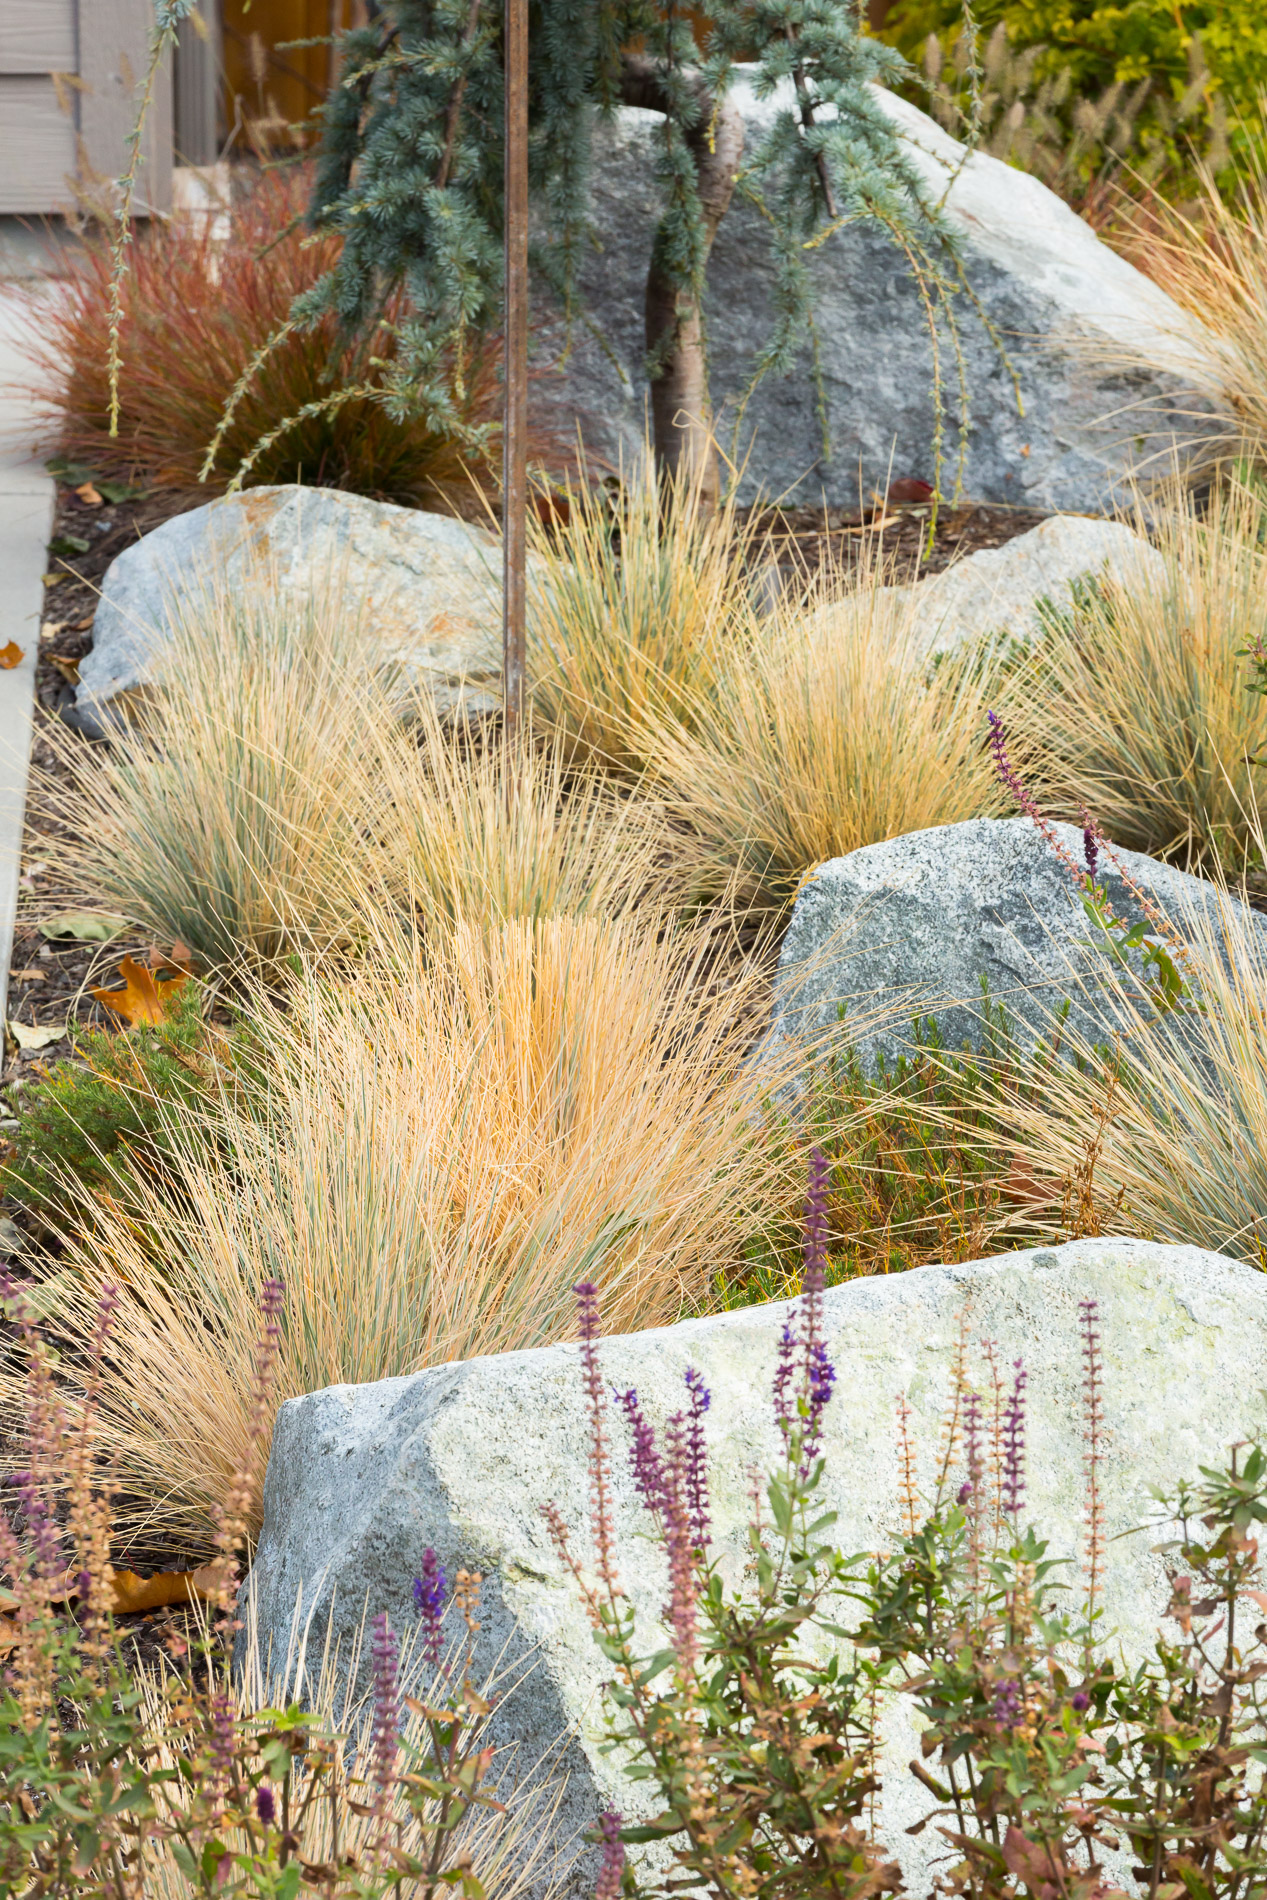 Drought-Tolerant Grass + Sedge Garden + Scattered Granite Boulders